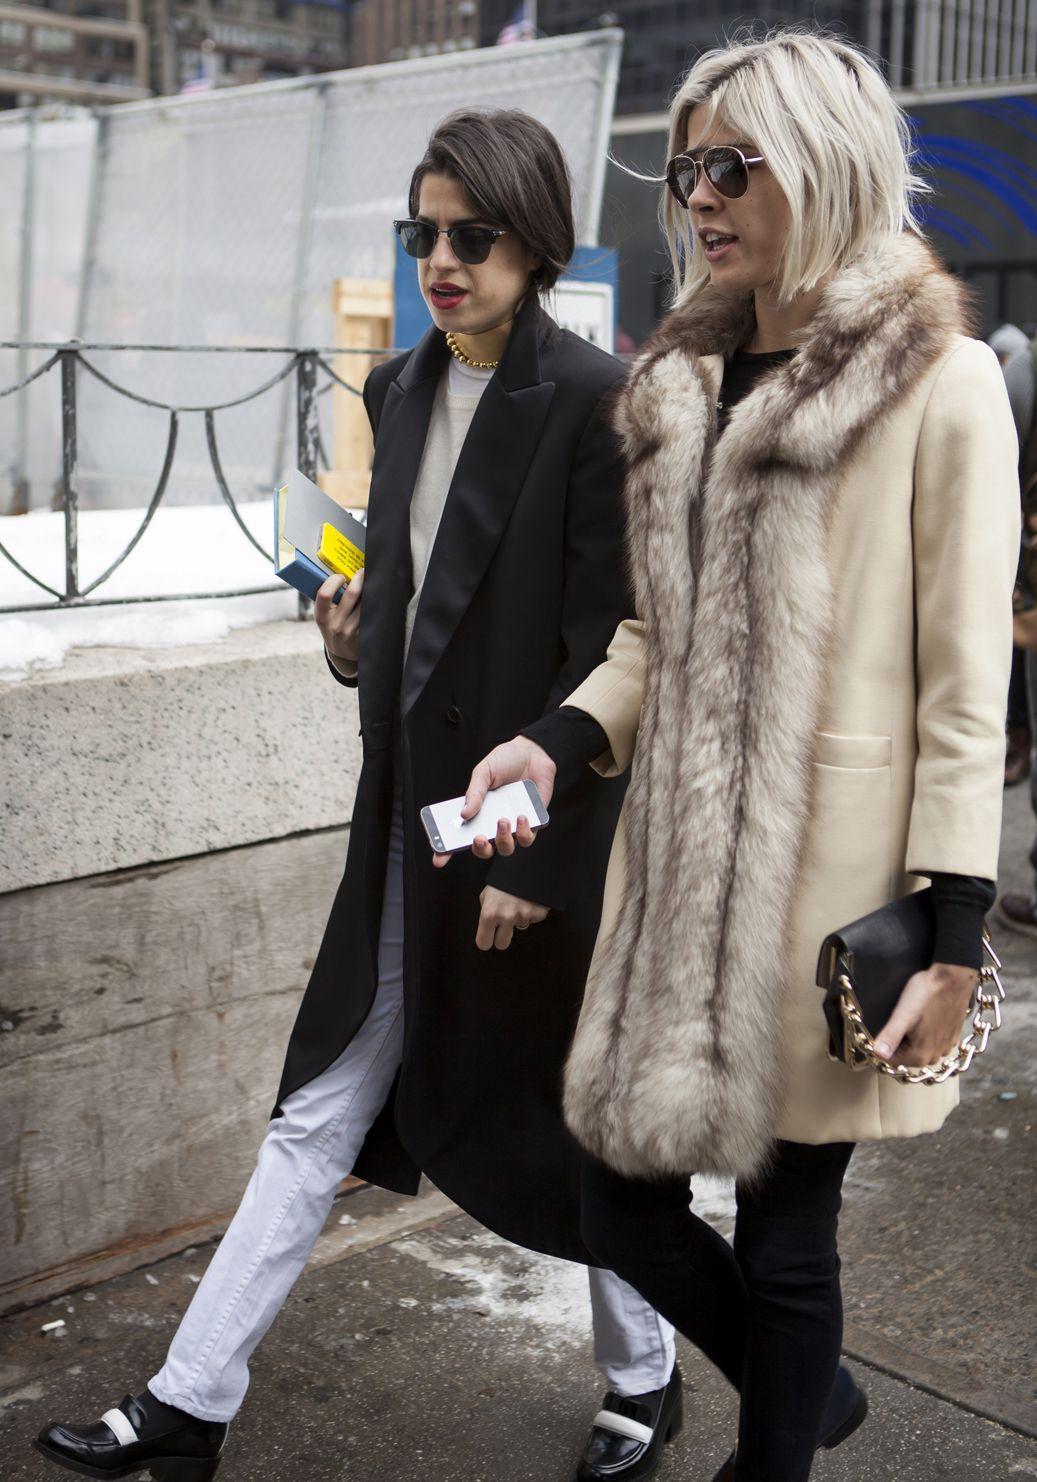 #NYFW Street Style Day 3 / Credit: Raydene Salinas / HPMG